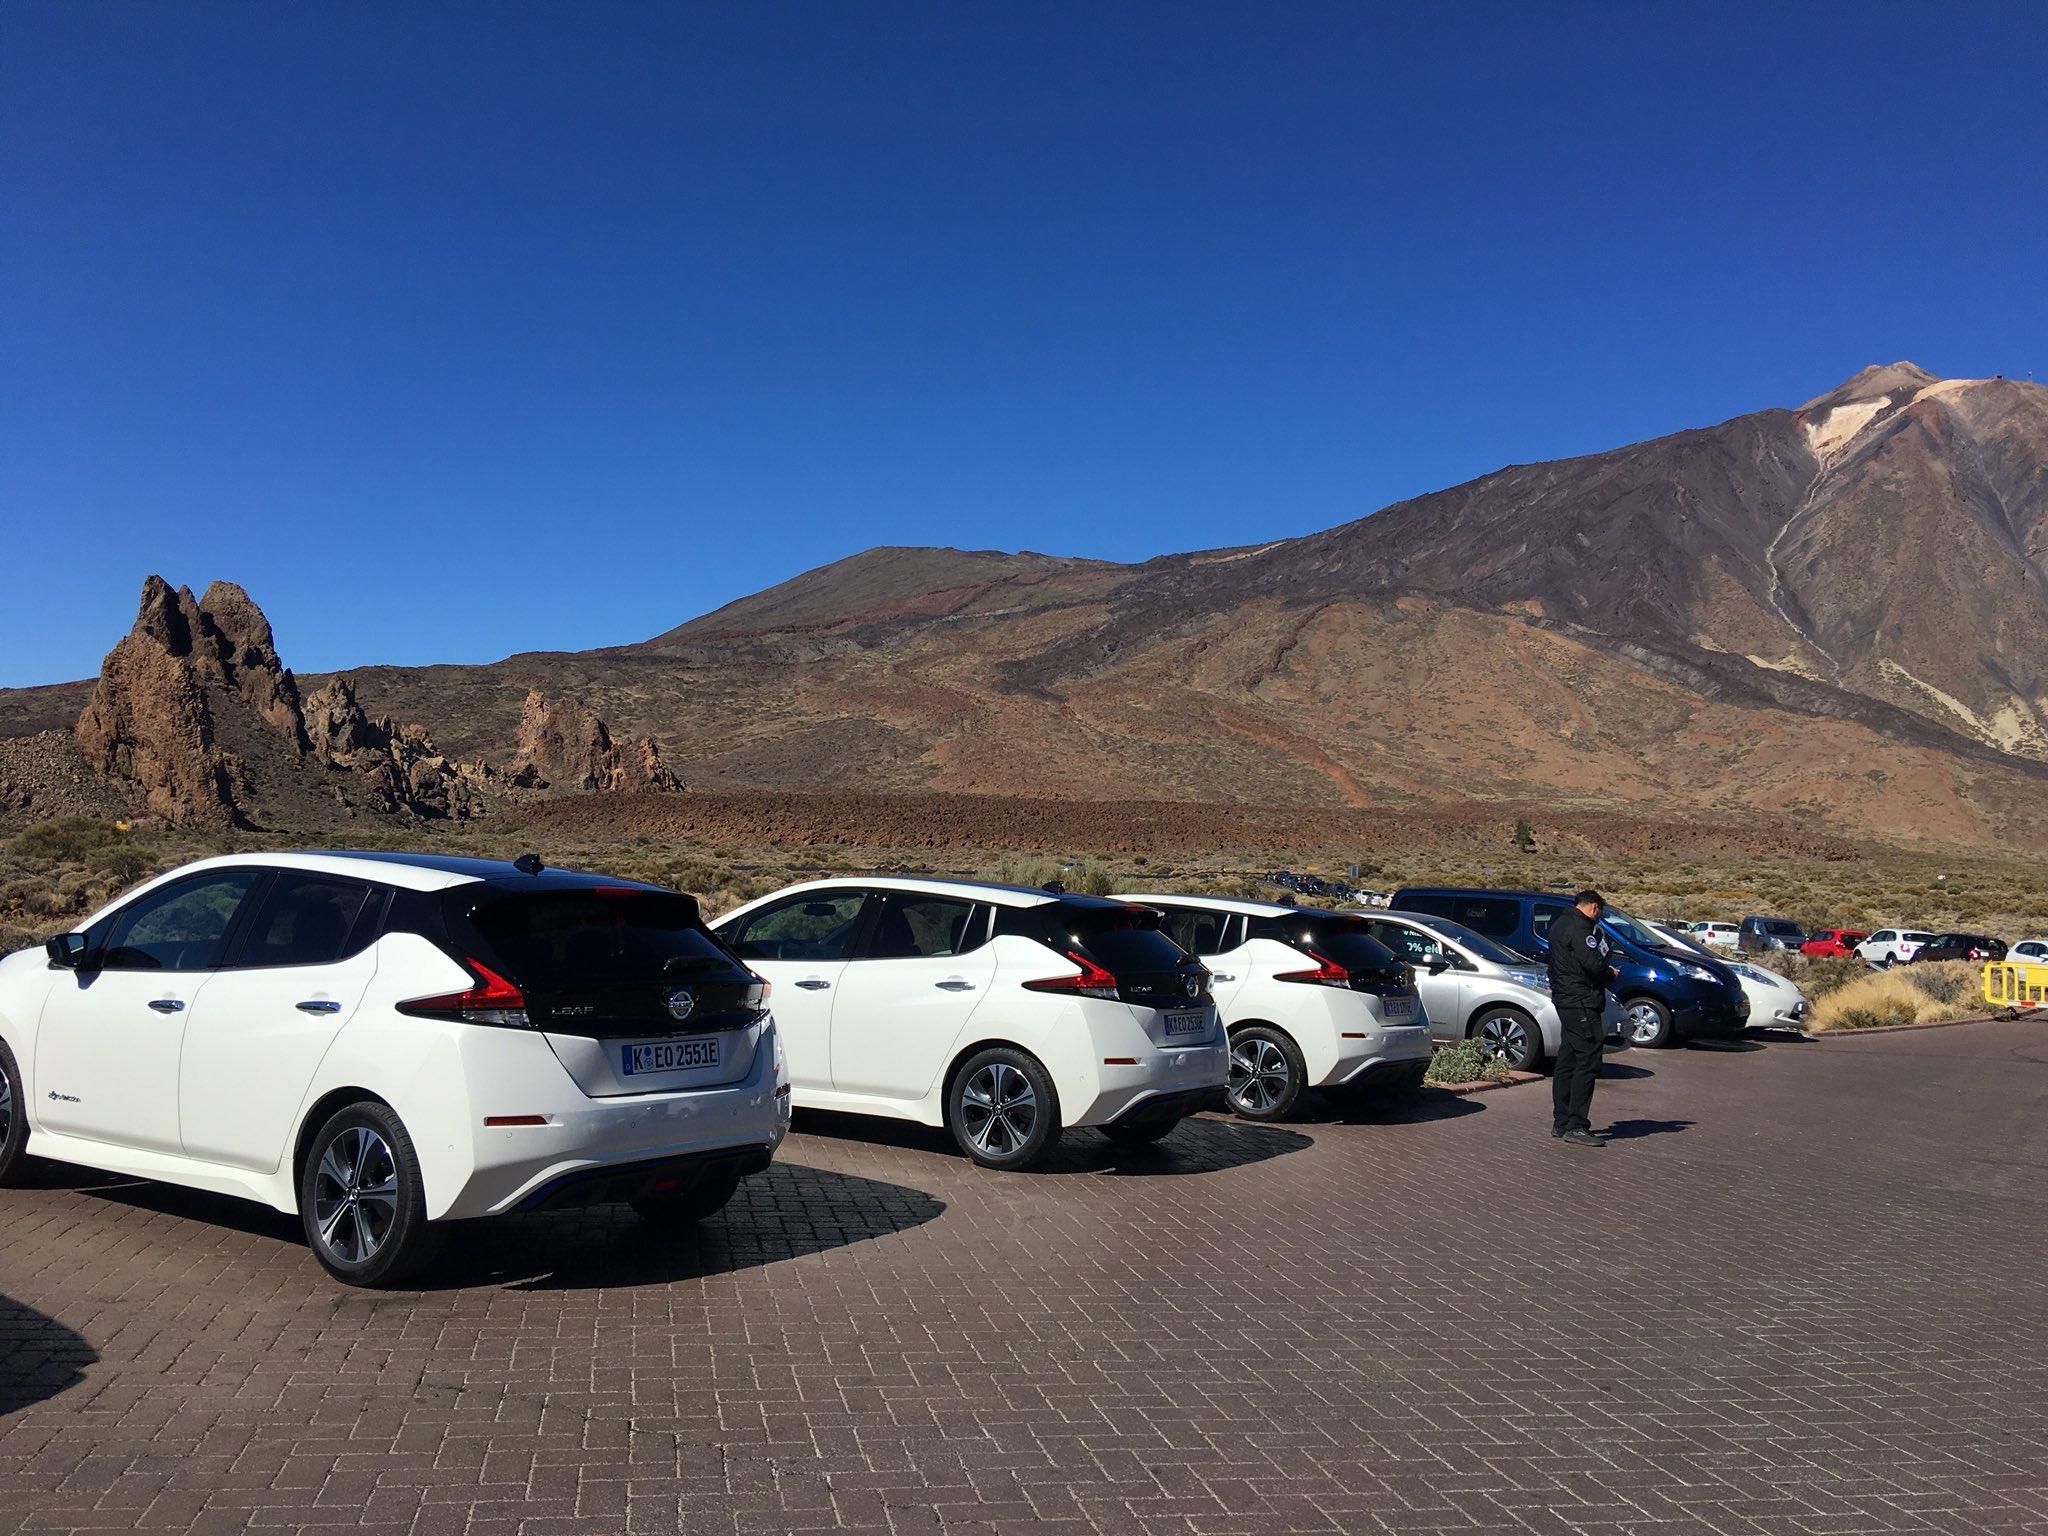 Proper mountain stuff going on. #NissanLEAF #Tenerife https://t.co/QFonR6jgMG